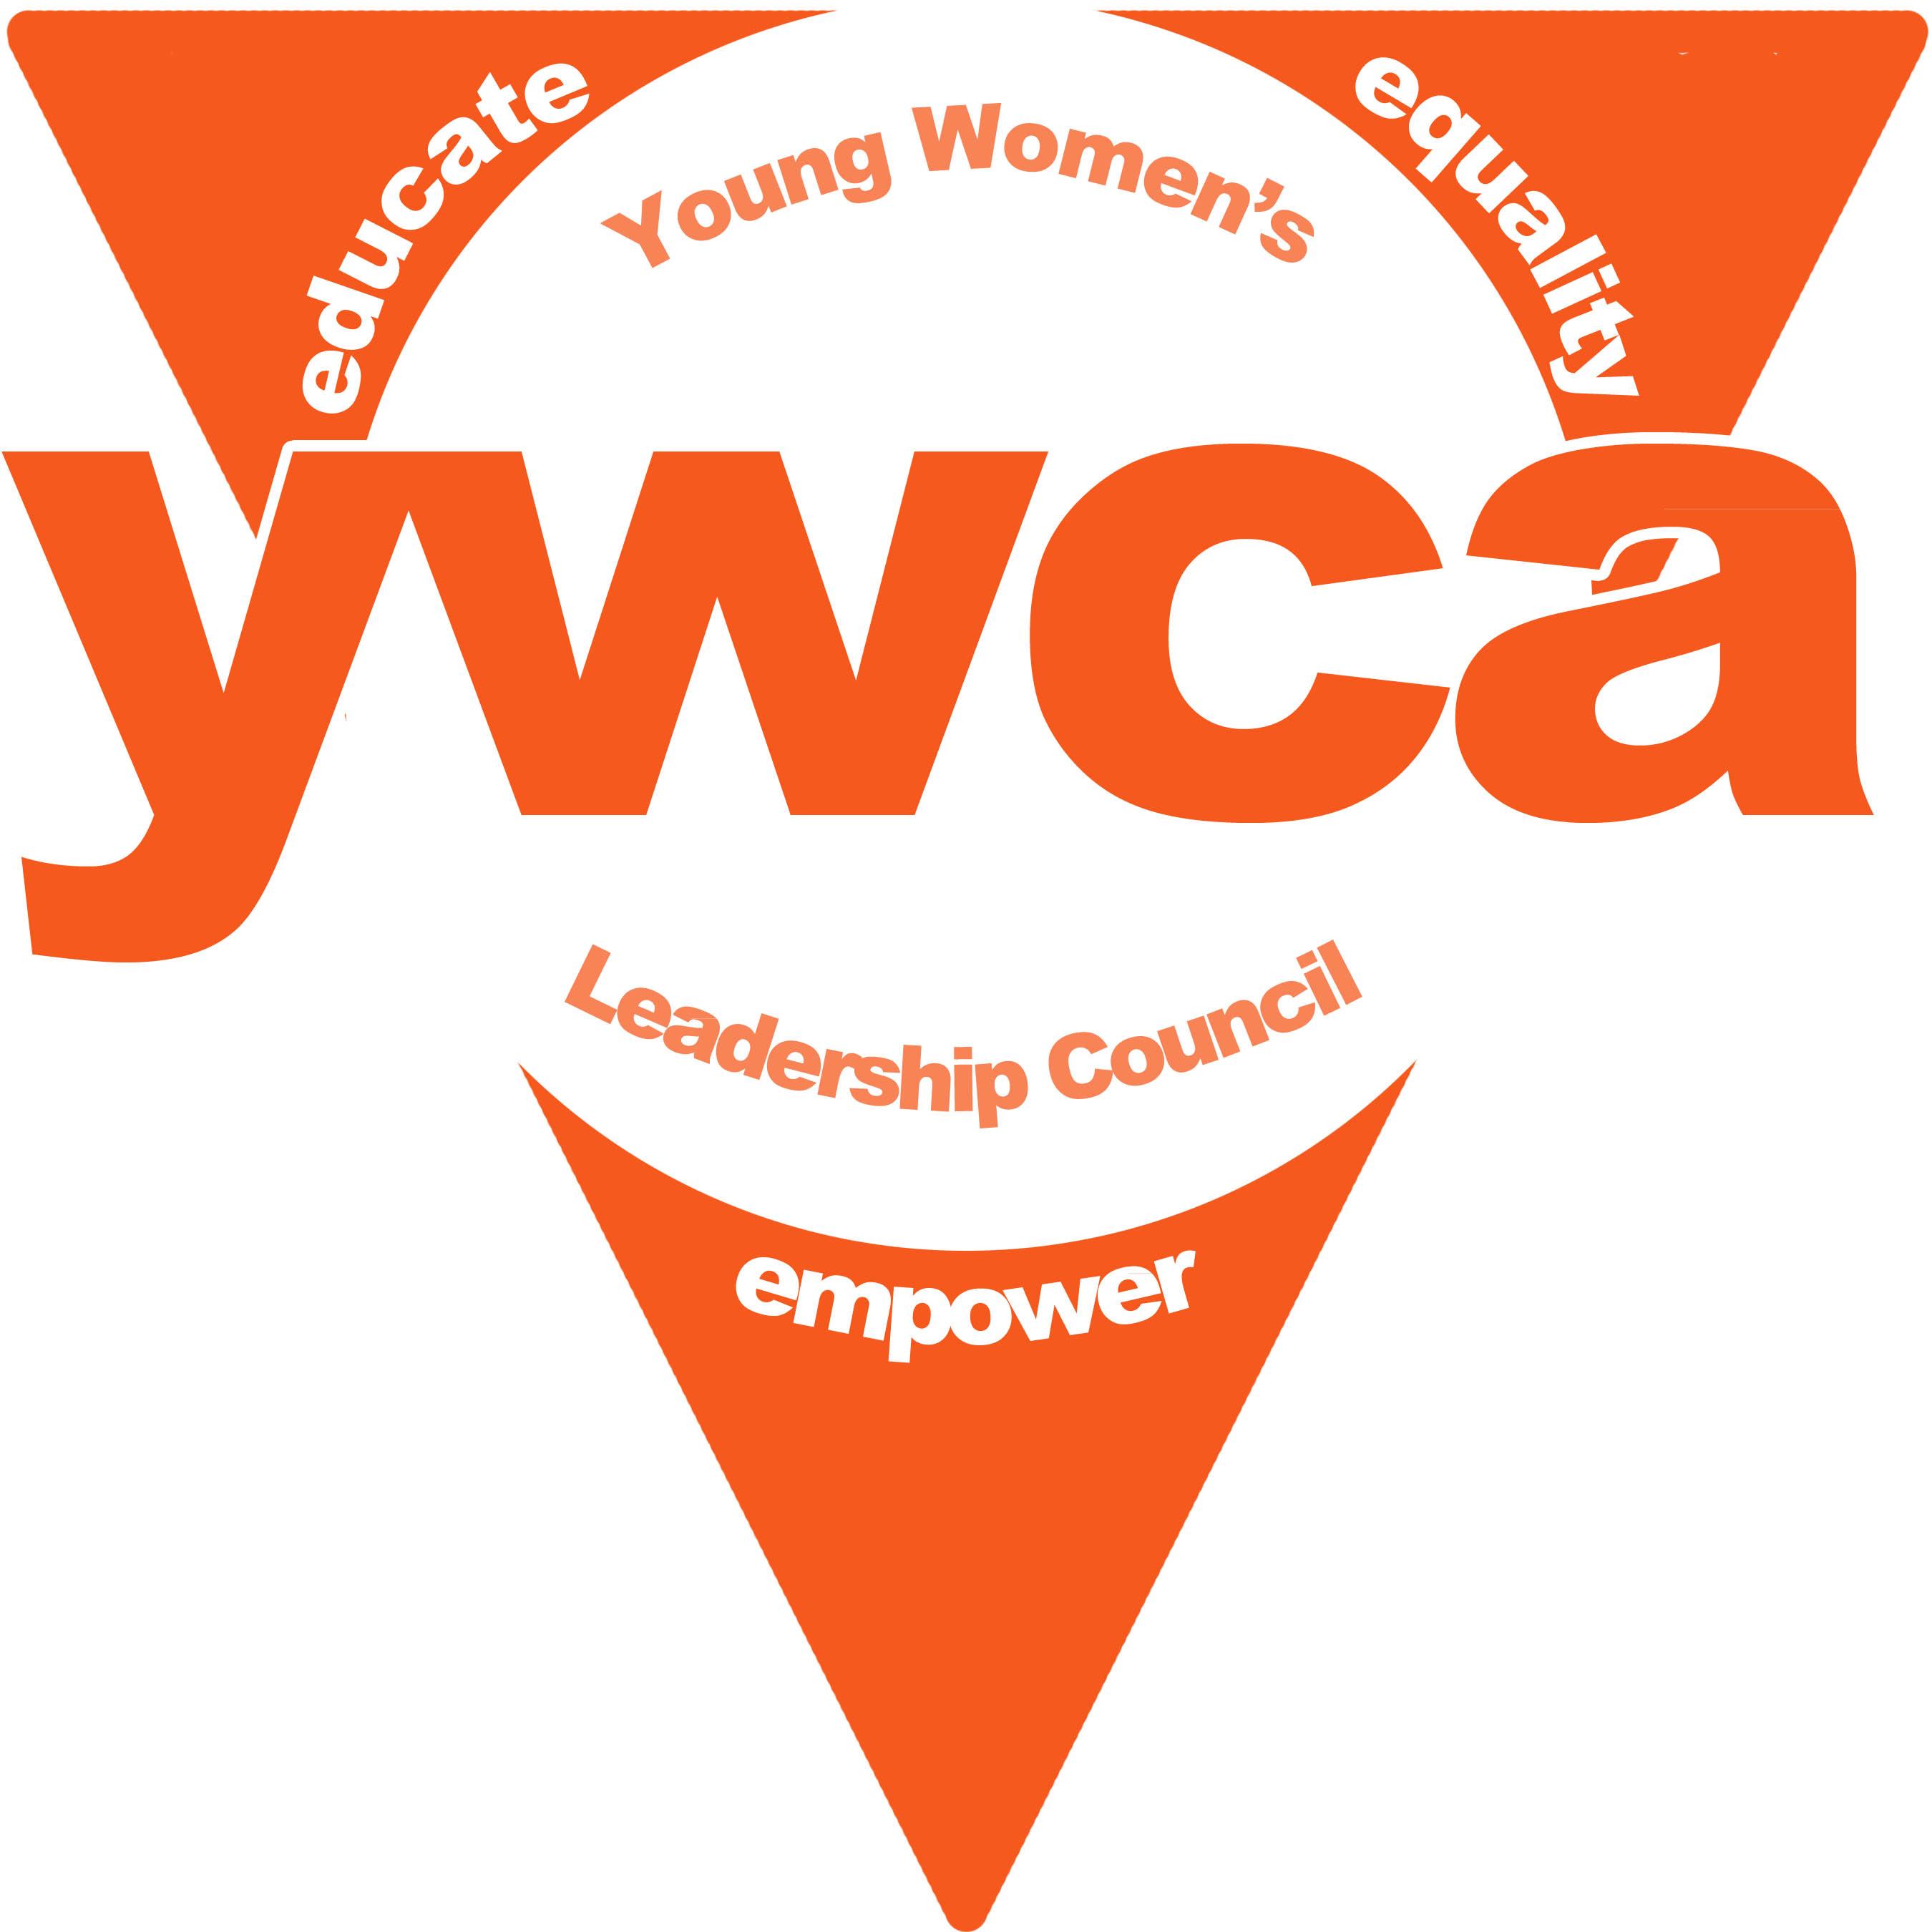 Ywca Logos